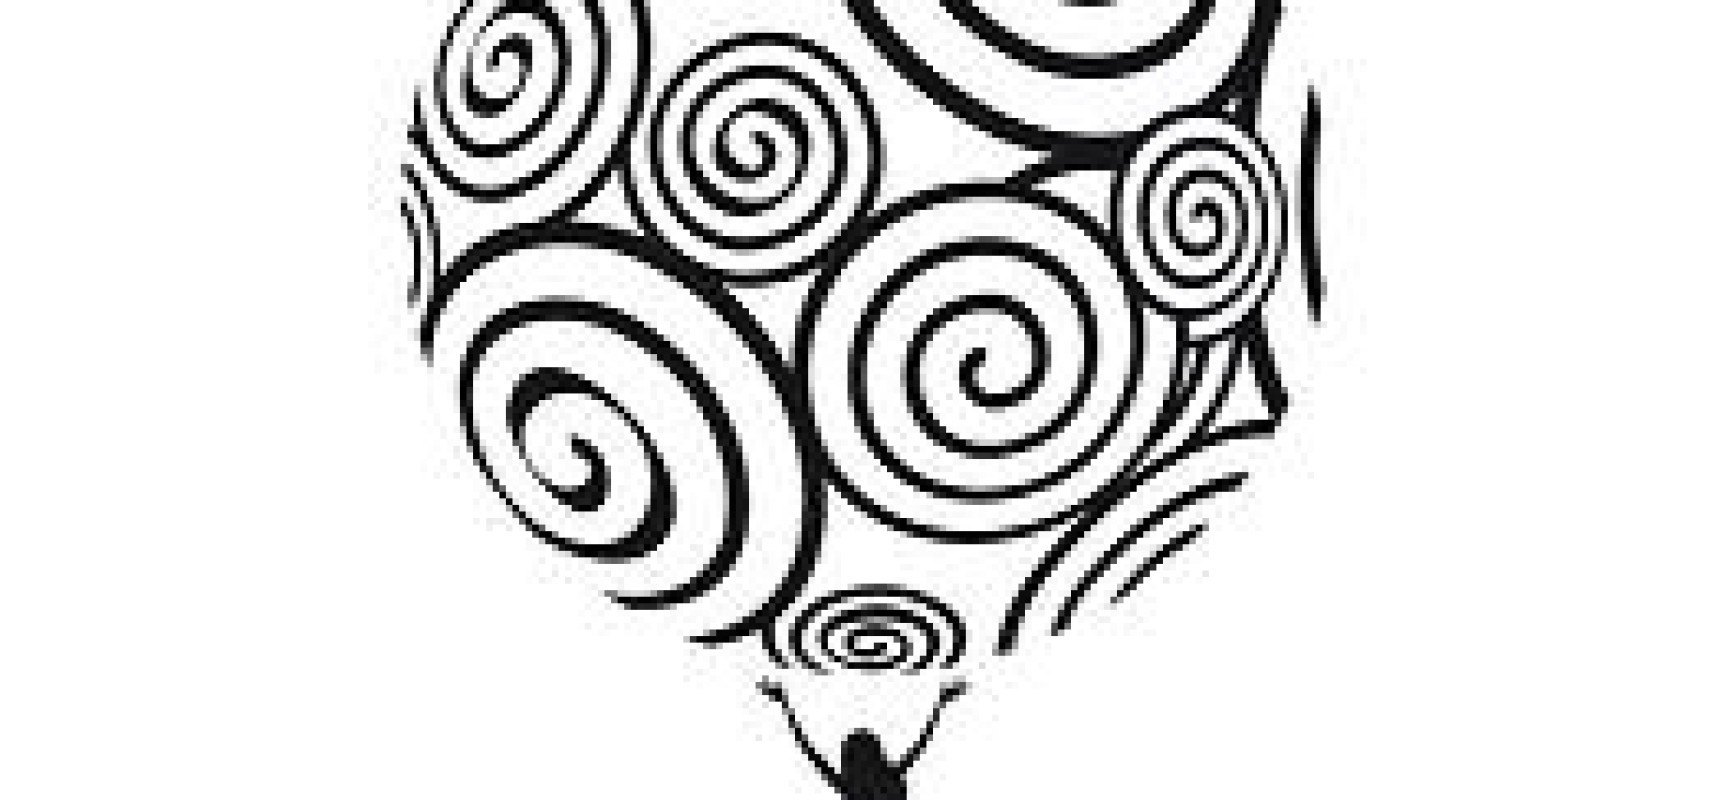 Ajedrez terapéutico e igualdad